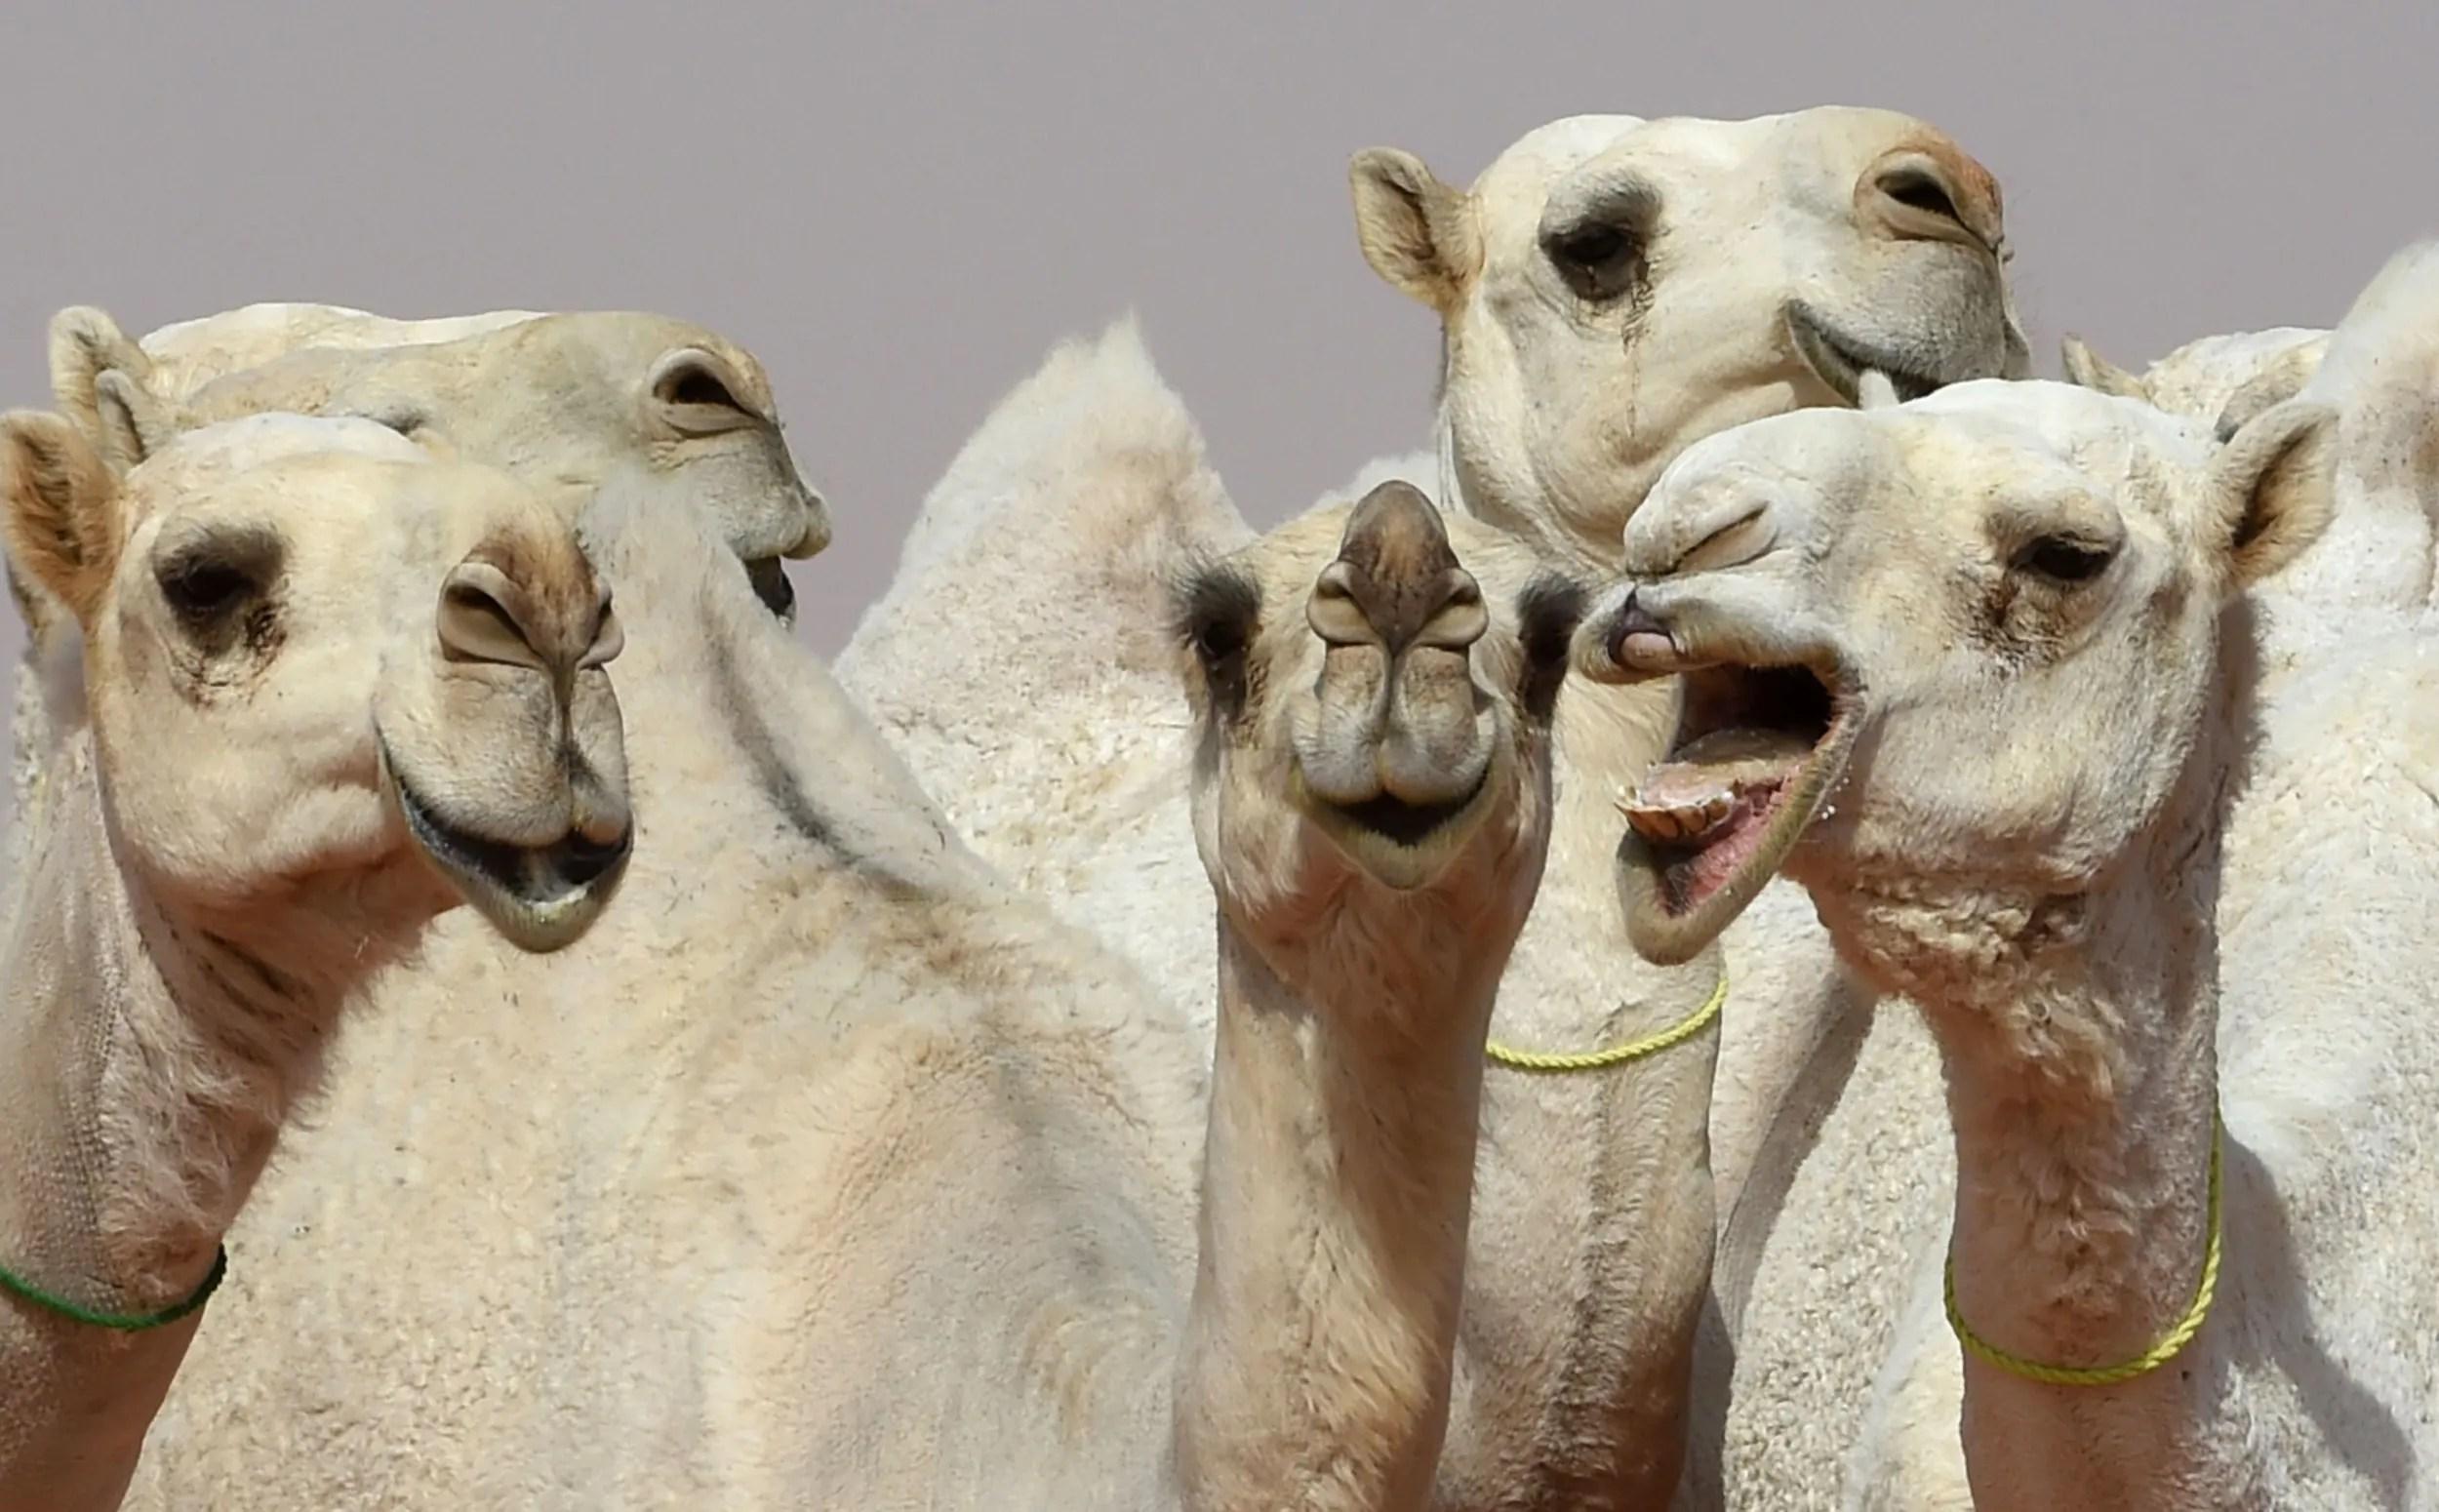 Fullsize Of Camel Camel Camel